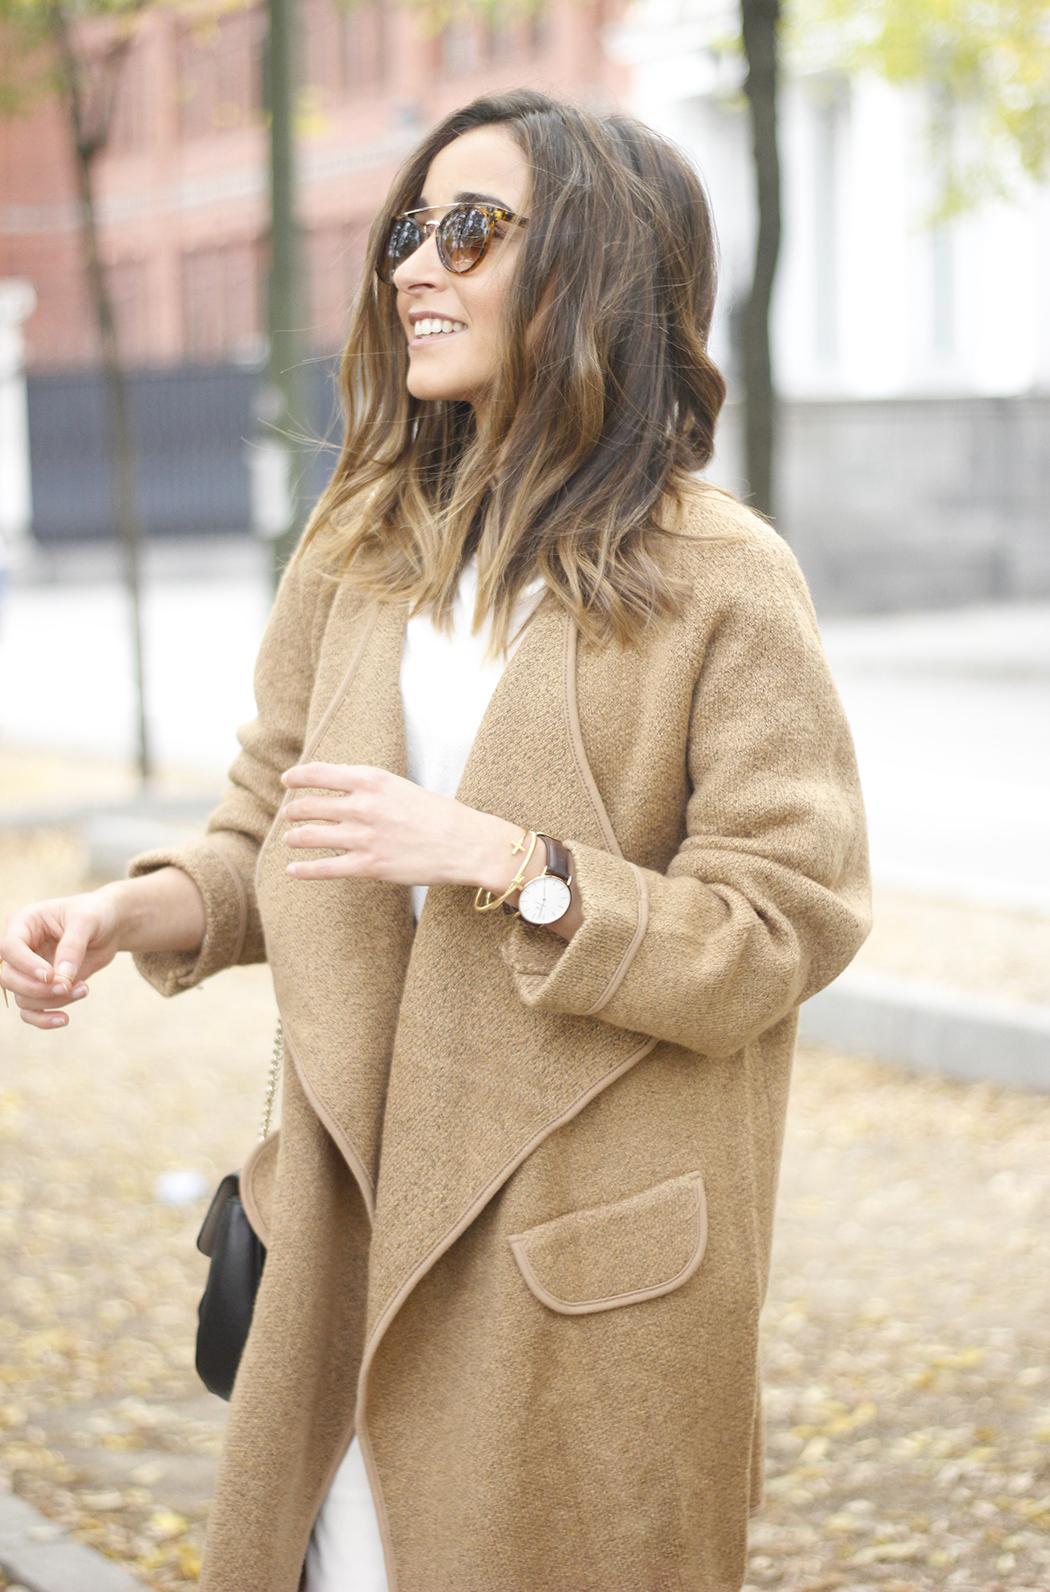 Camel Coat sheinside white outfit heels uterqüe purse outfit17